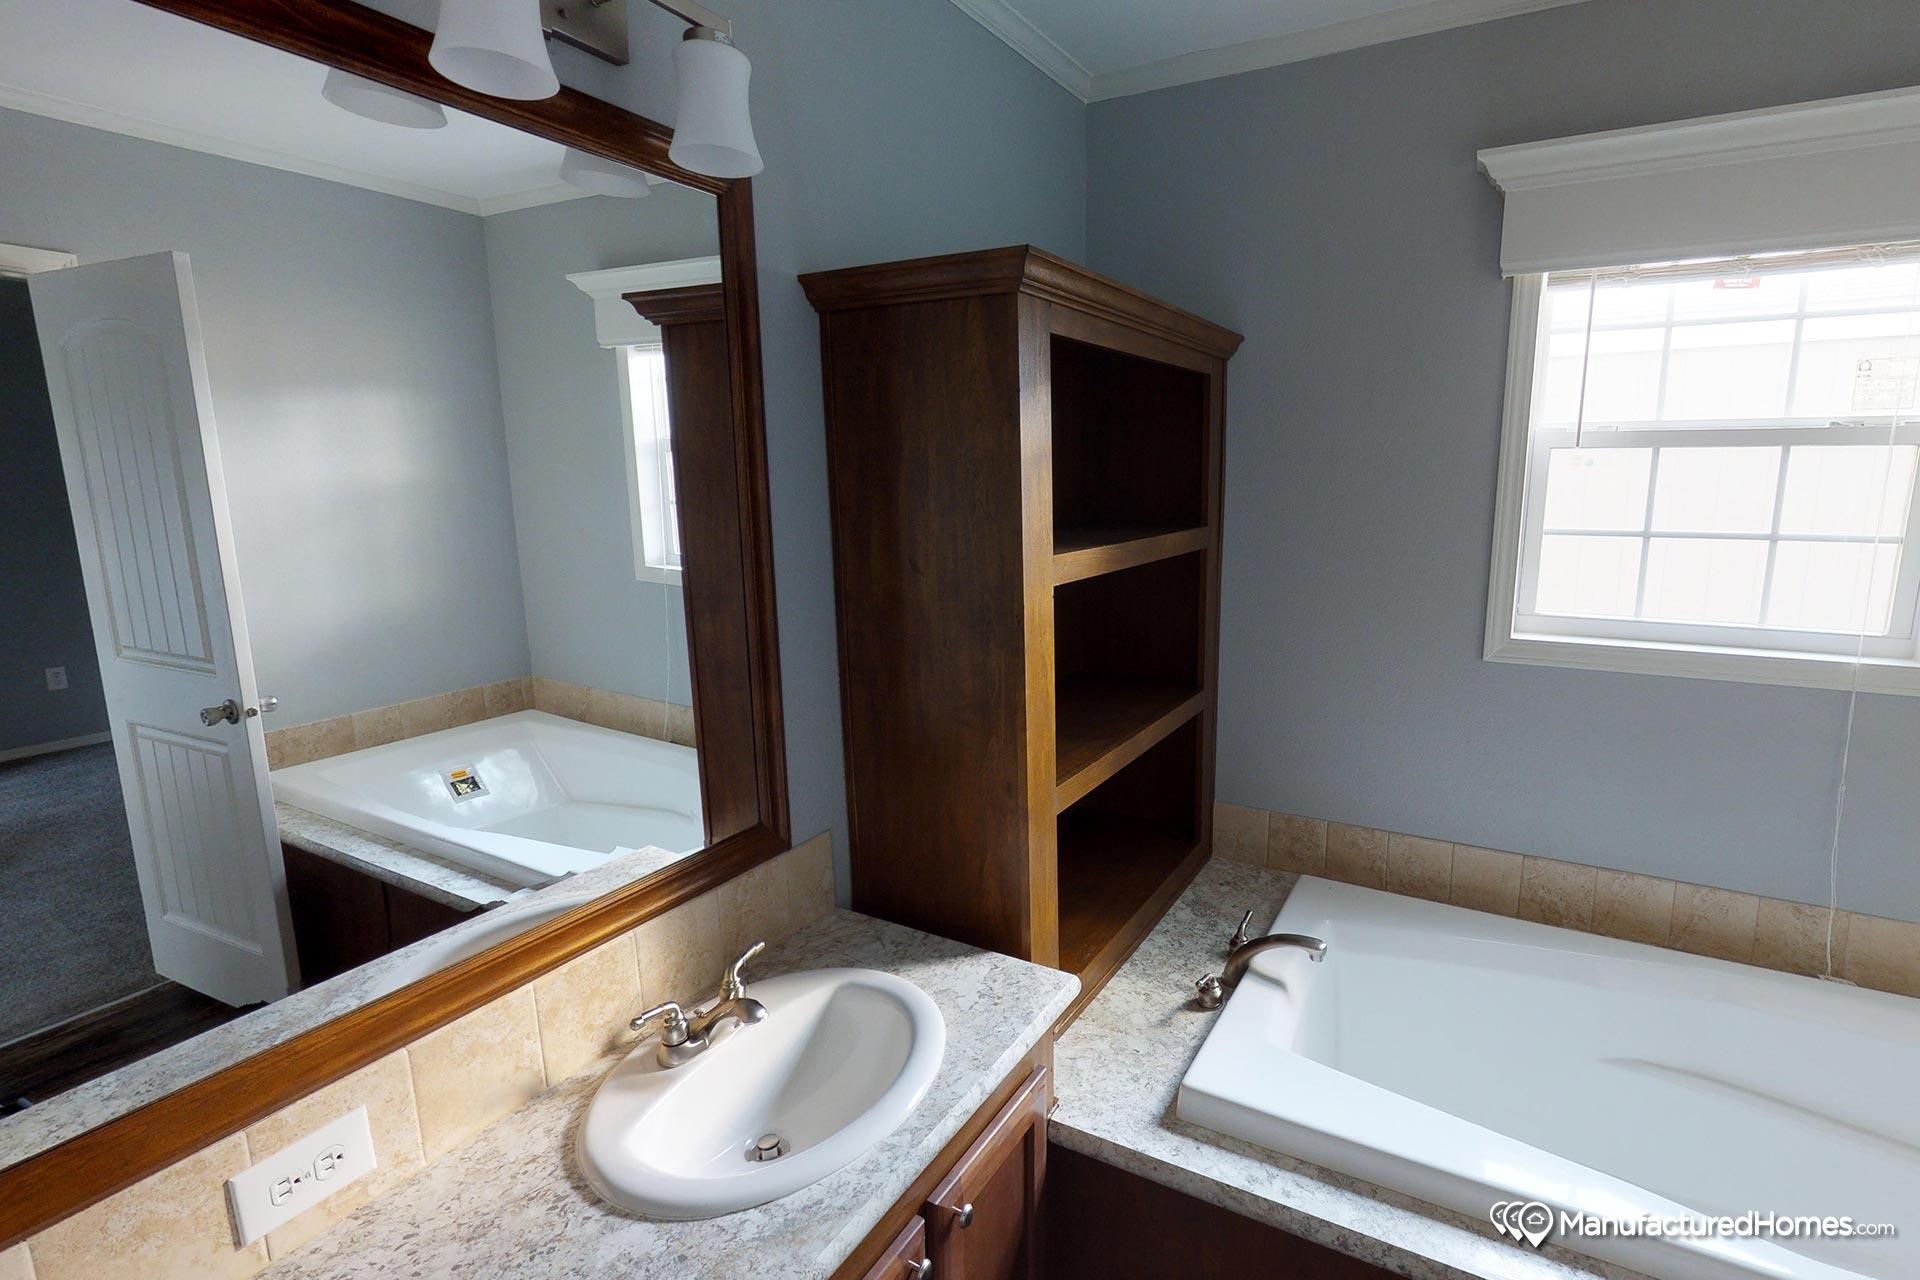 Nautica / Glenn J78G - Bathroom